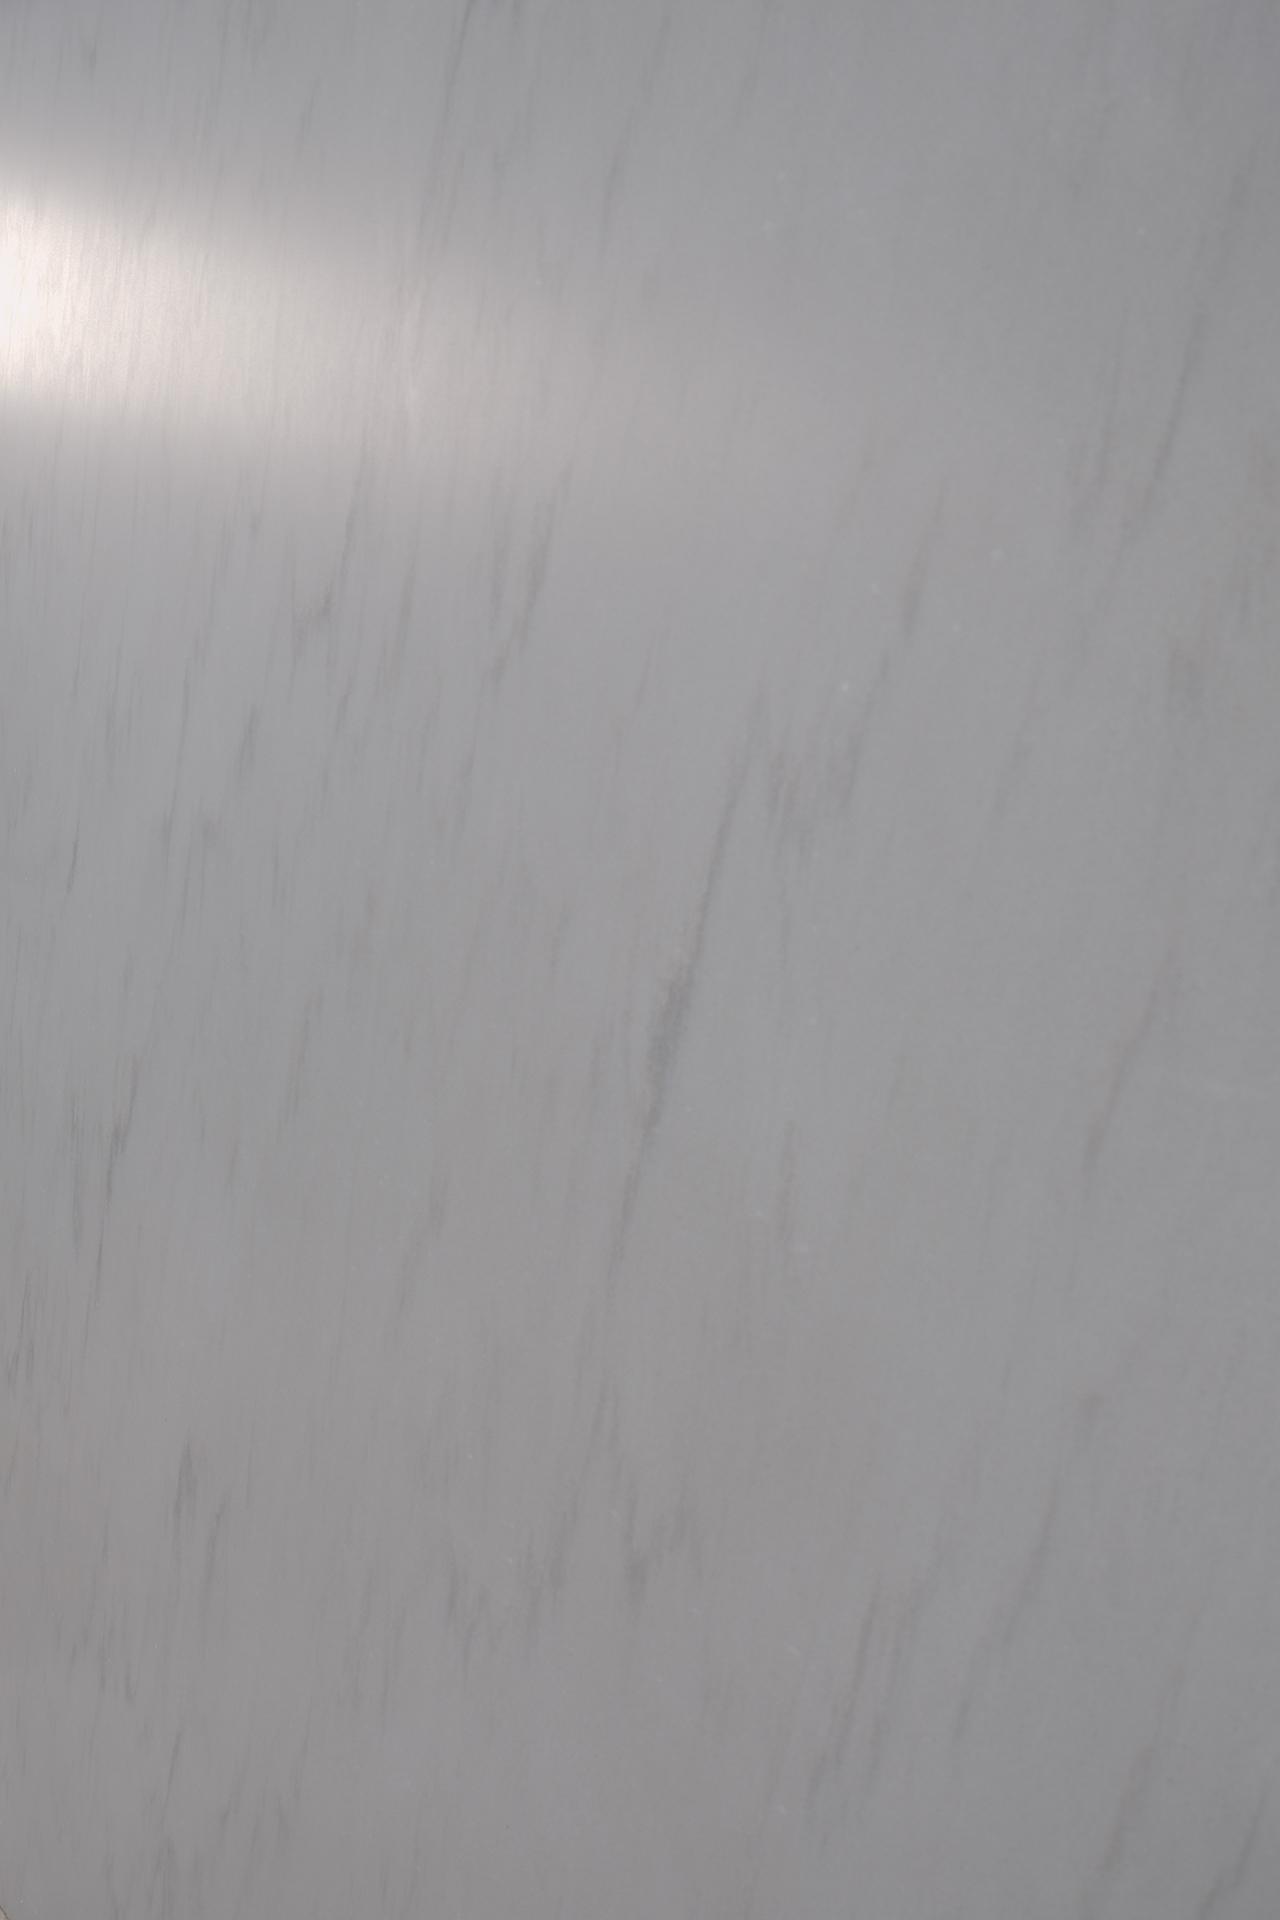 Detail der feingeschliffenen Oberfläche_Silver Quarzit